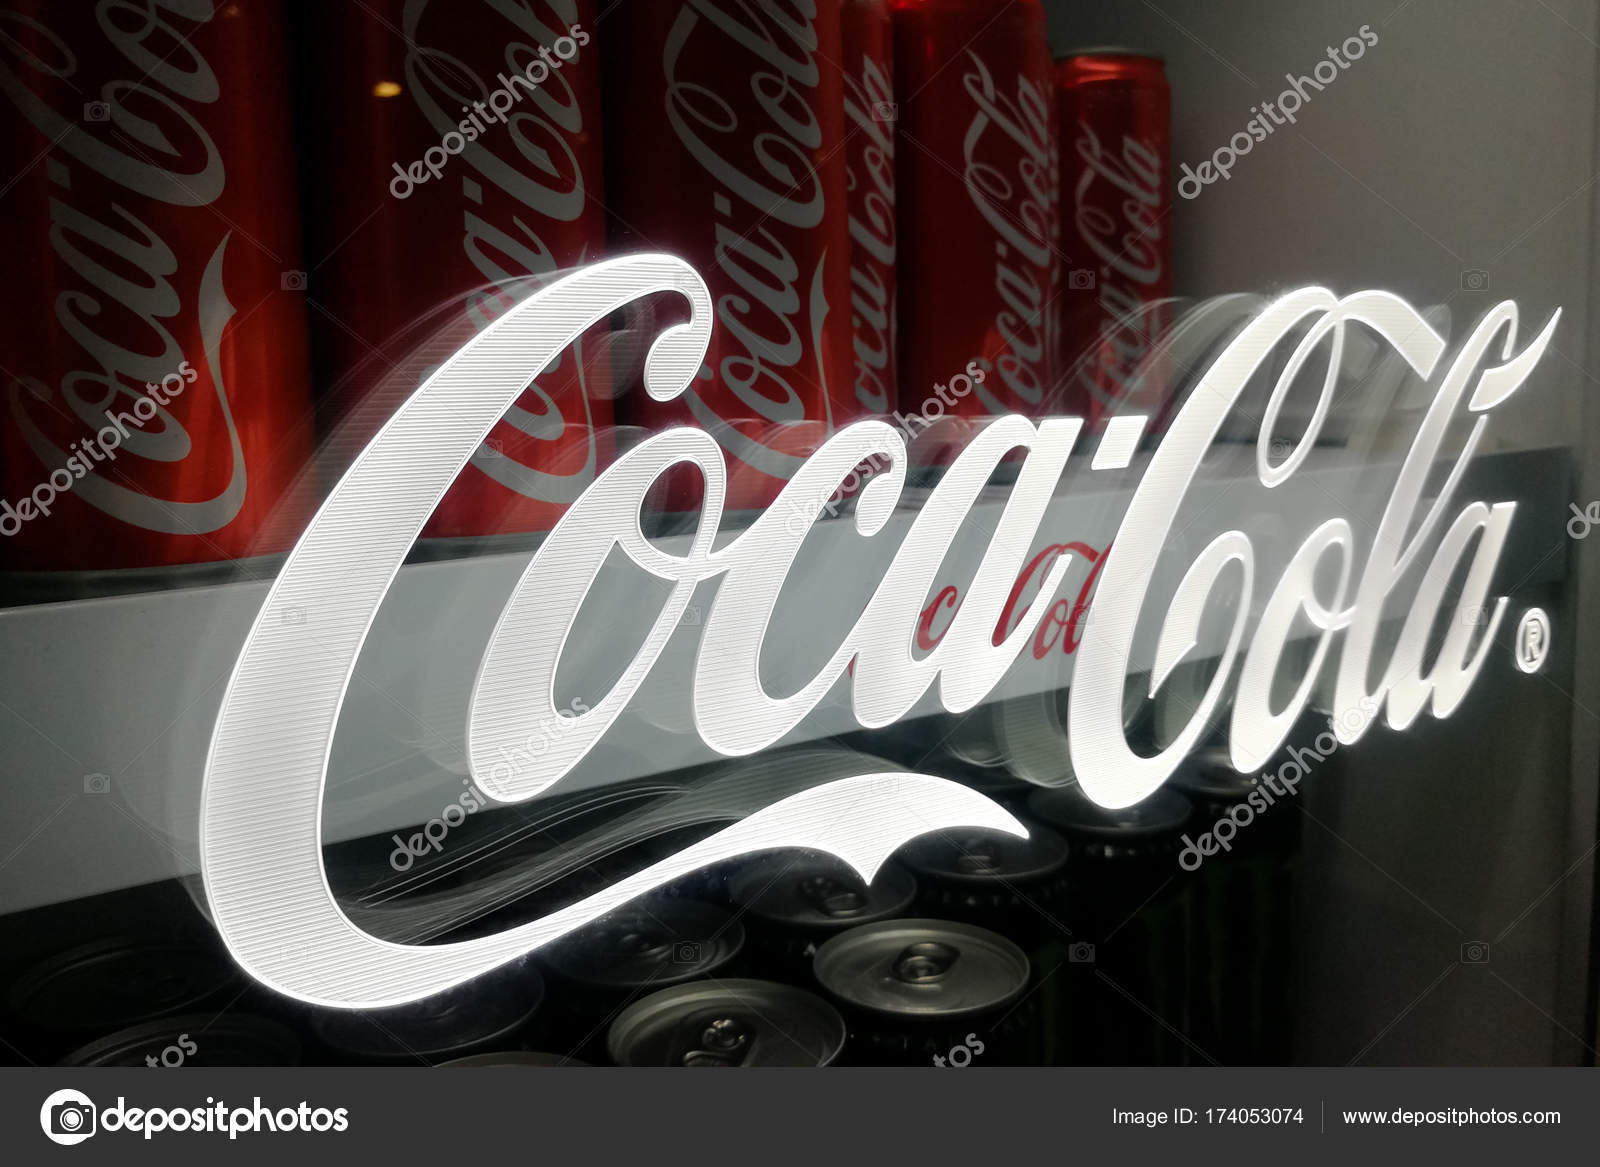 Amerikanischer Kühlschrank Coca Cola : Minsk belarus mai coca cola glas flaschen kühlschrank hautnah